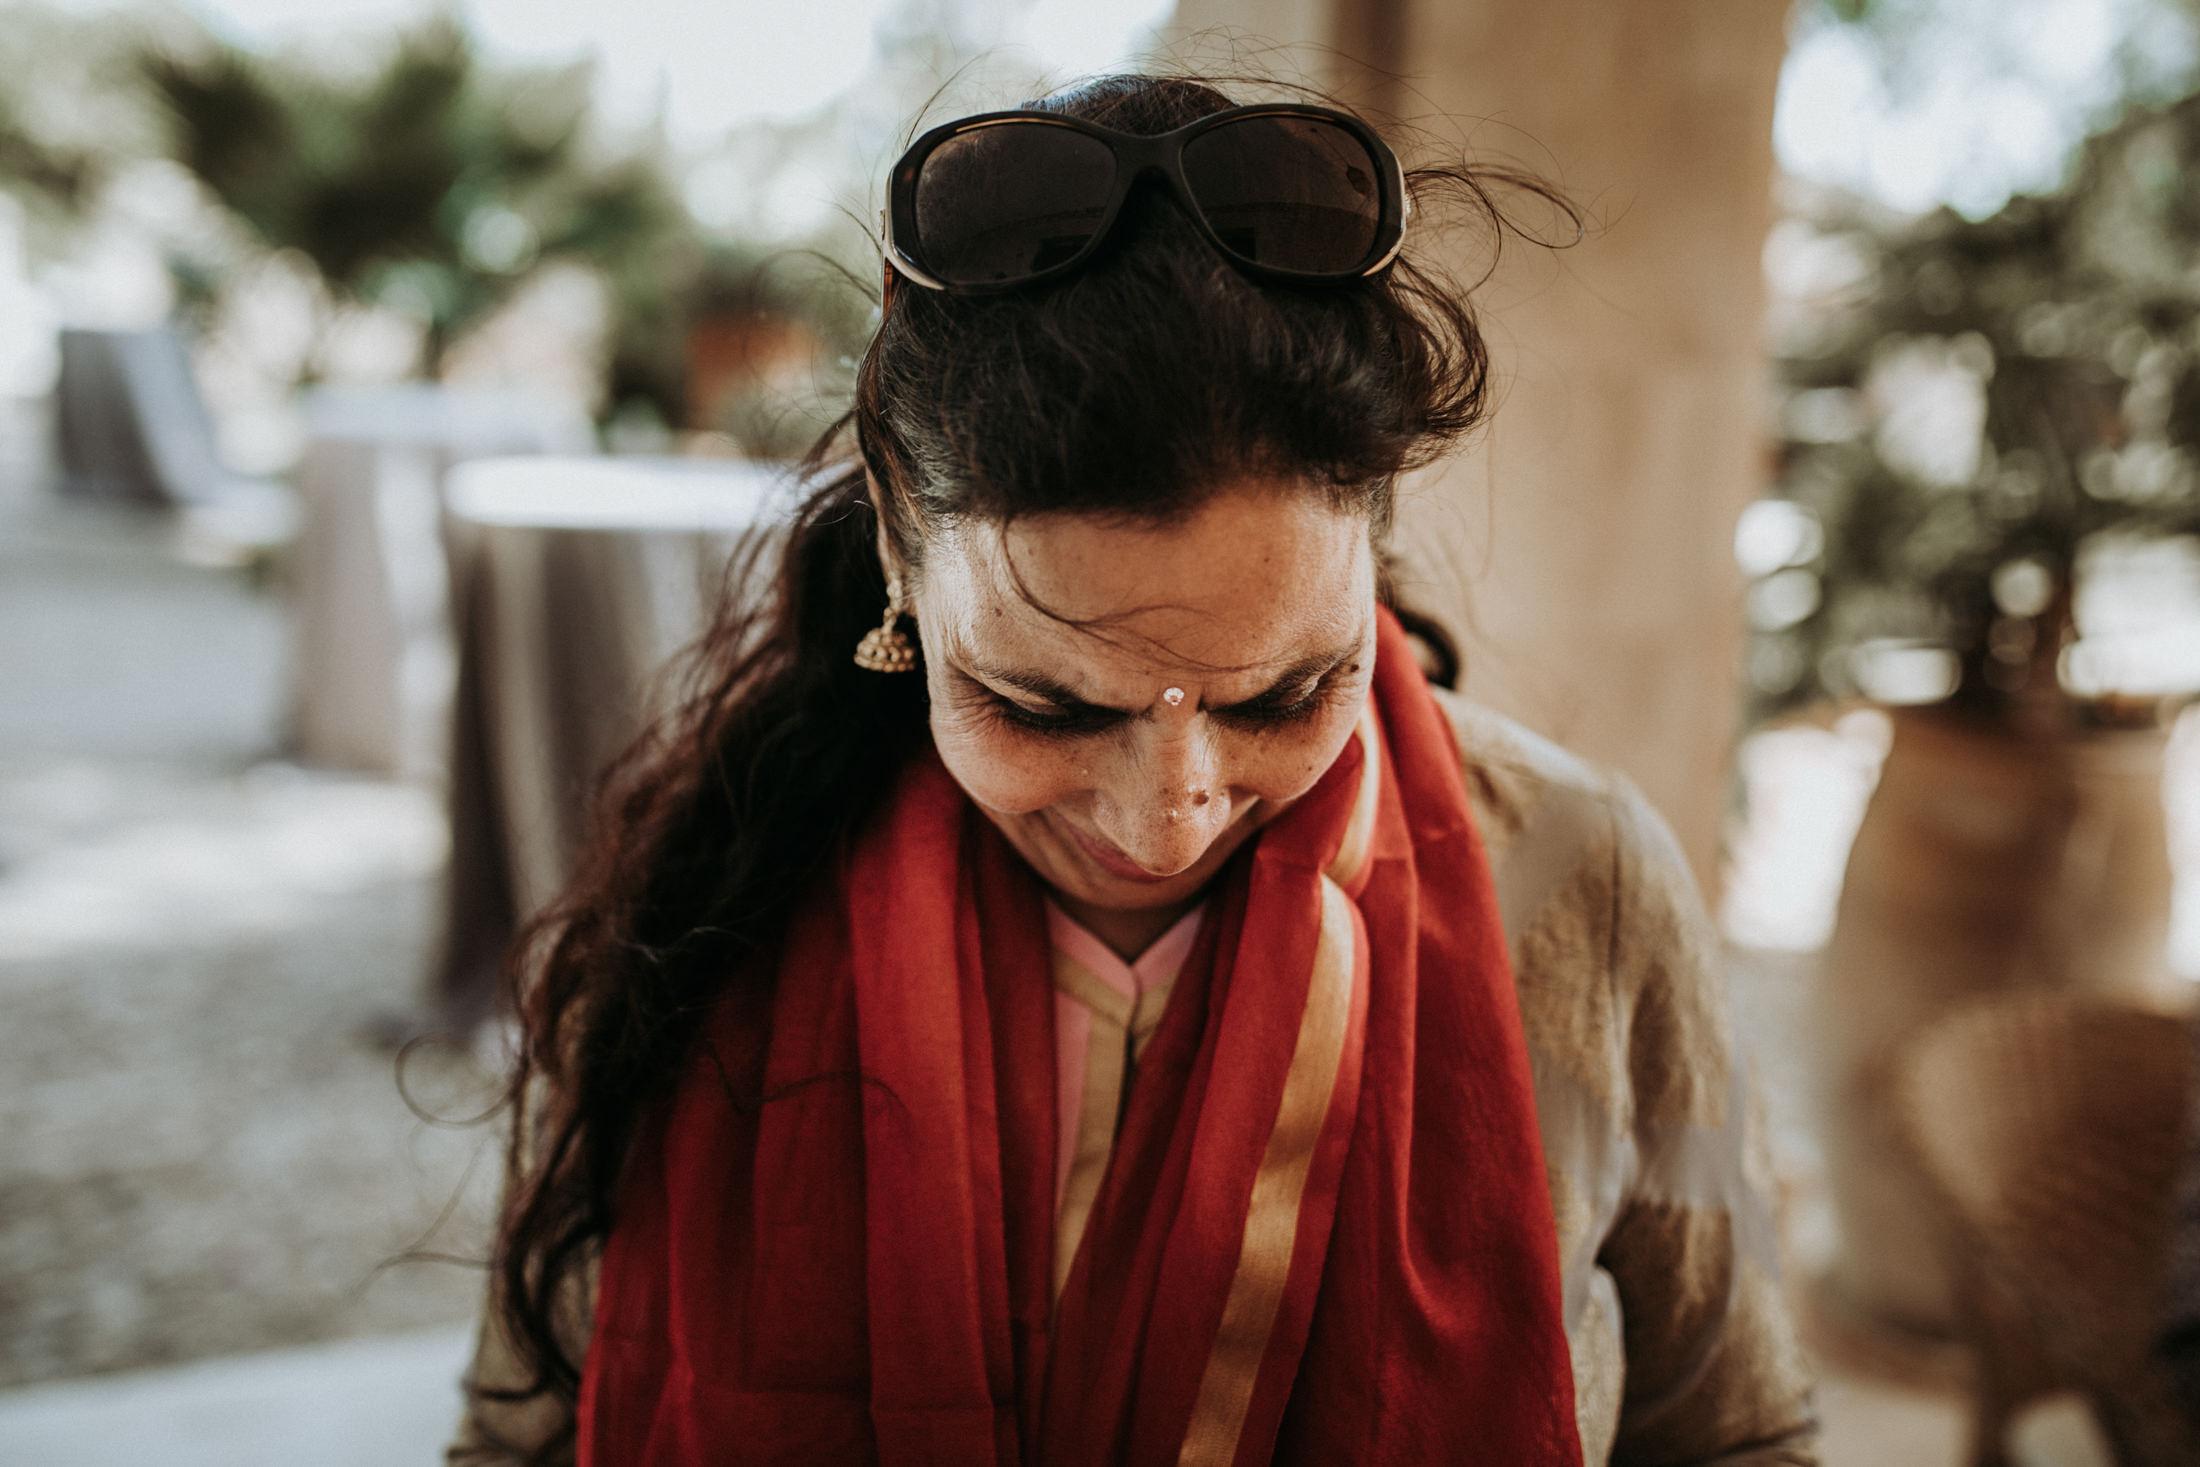 Wedding_Photographer_Mallorca_Daniela-Marquardt_Photography_New_York_Iceland_Tuscany_Santorini_Portugal_Austria_Bavaria_Elopement_Hochzeitsfotograf_AntjeRajat1_27